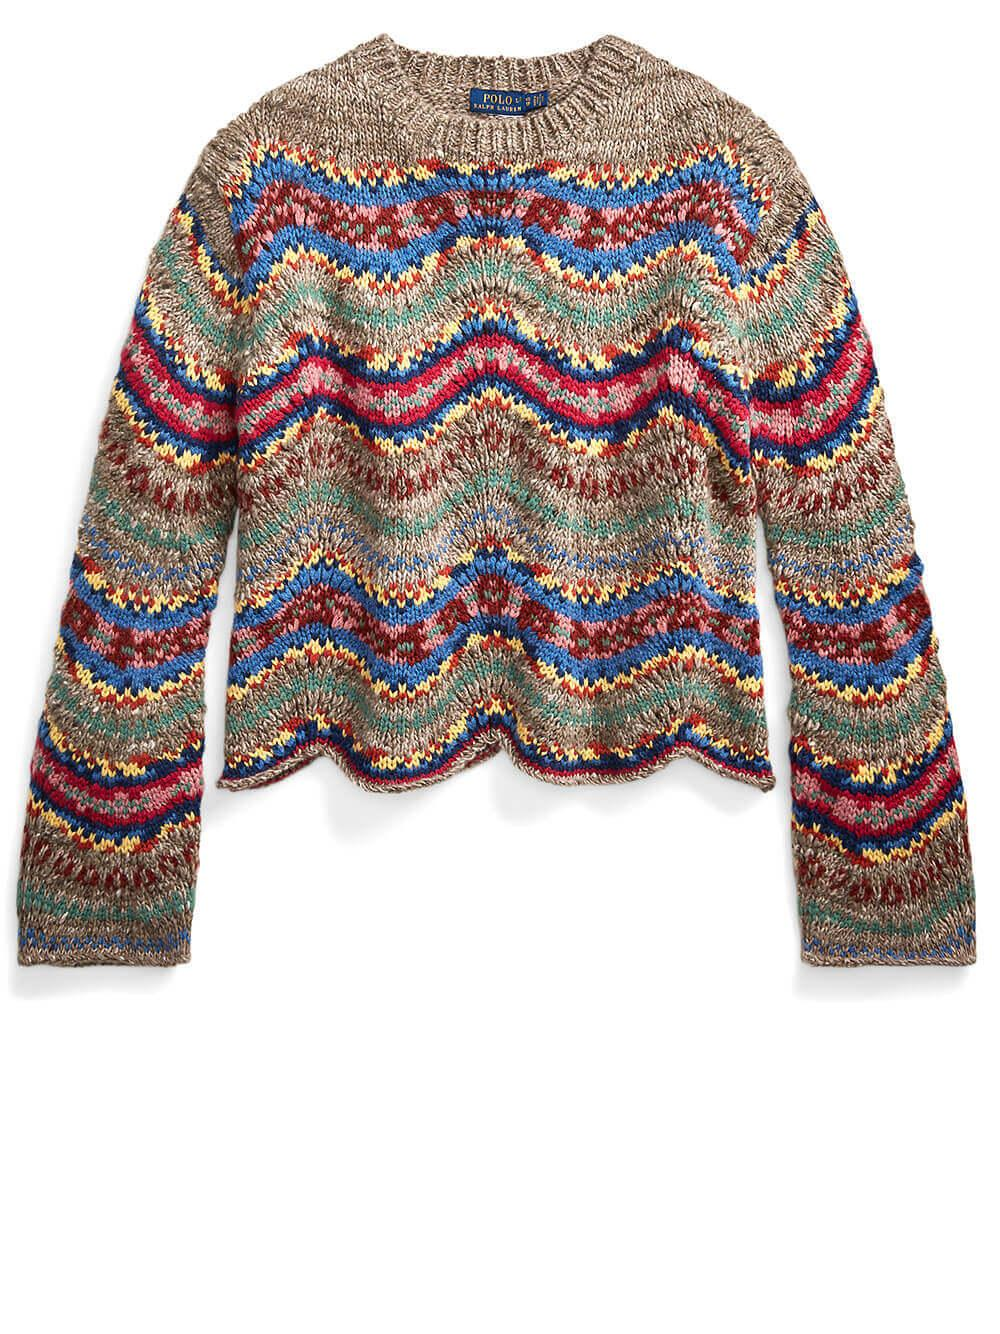 Fair Isle Sweater Item # 211815134001